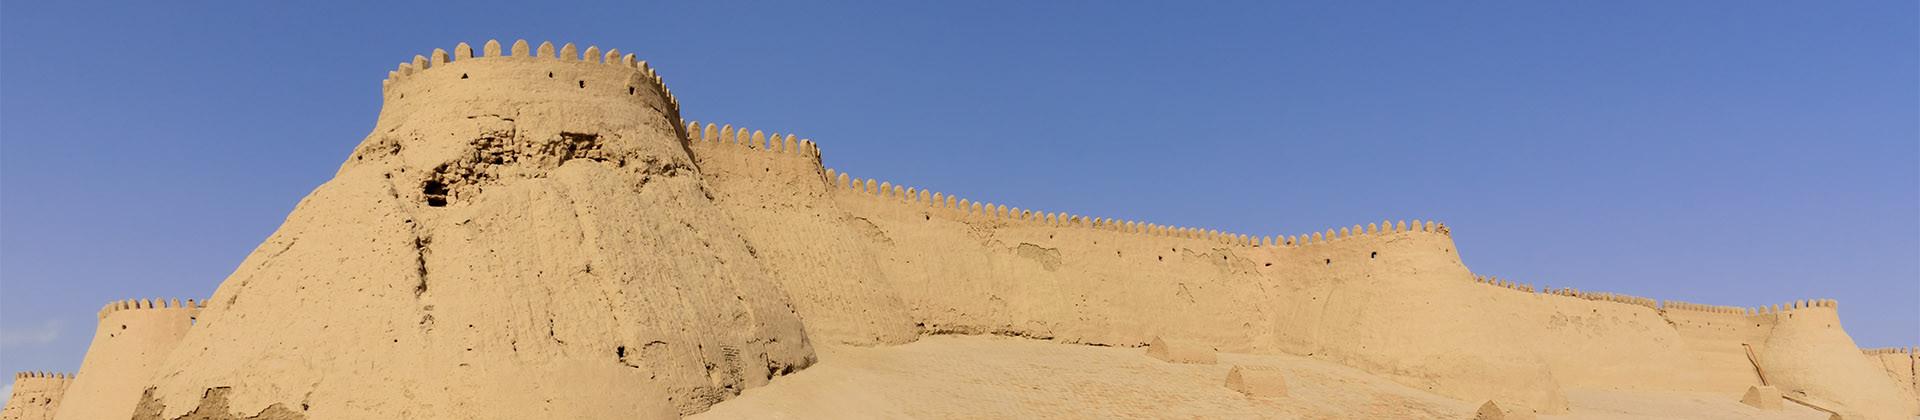 Khiva - a city museum (Economy) - 1